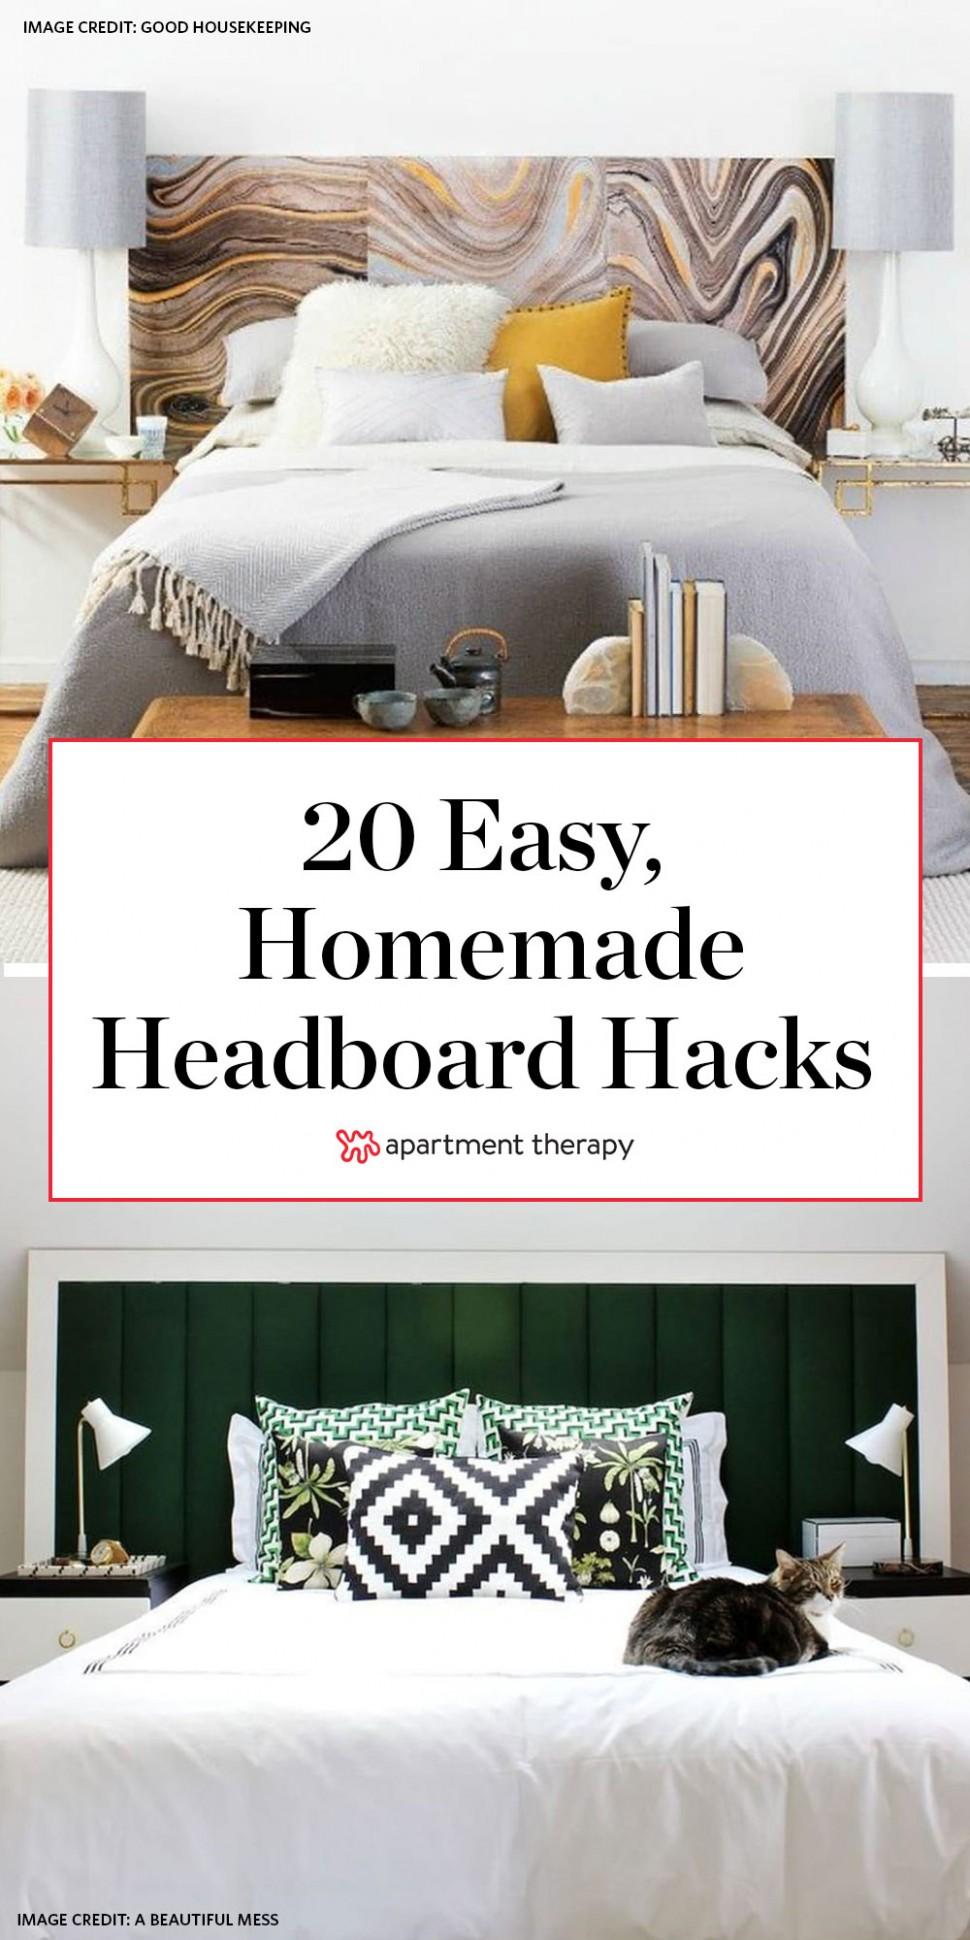 9+ Easy DIY Homemade Headboard Ideas - How to Make a Bed  - Bedroom Ideas Headboard